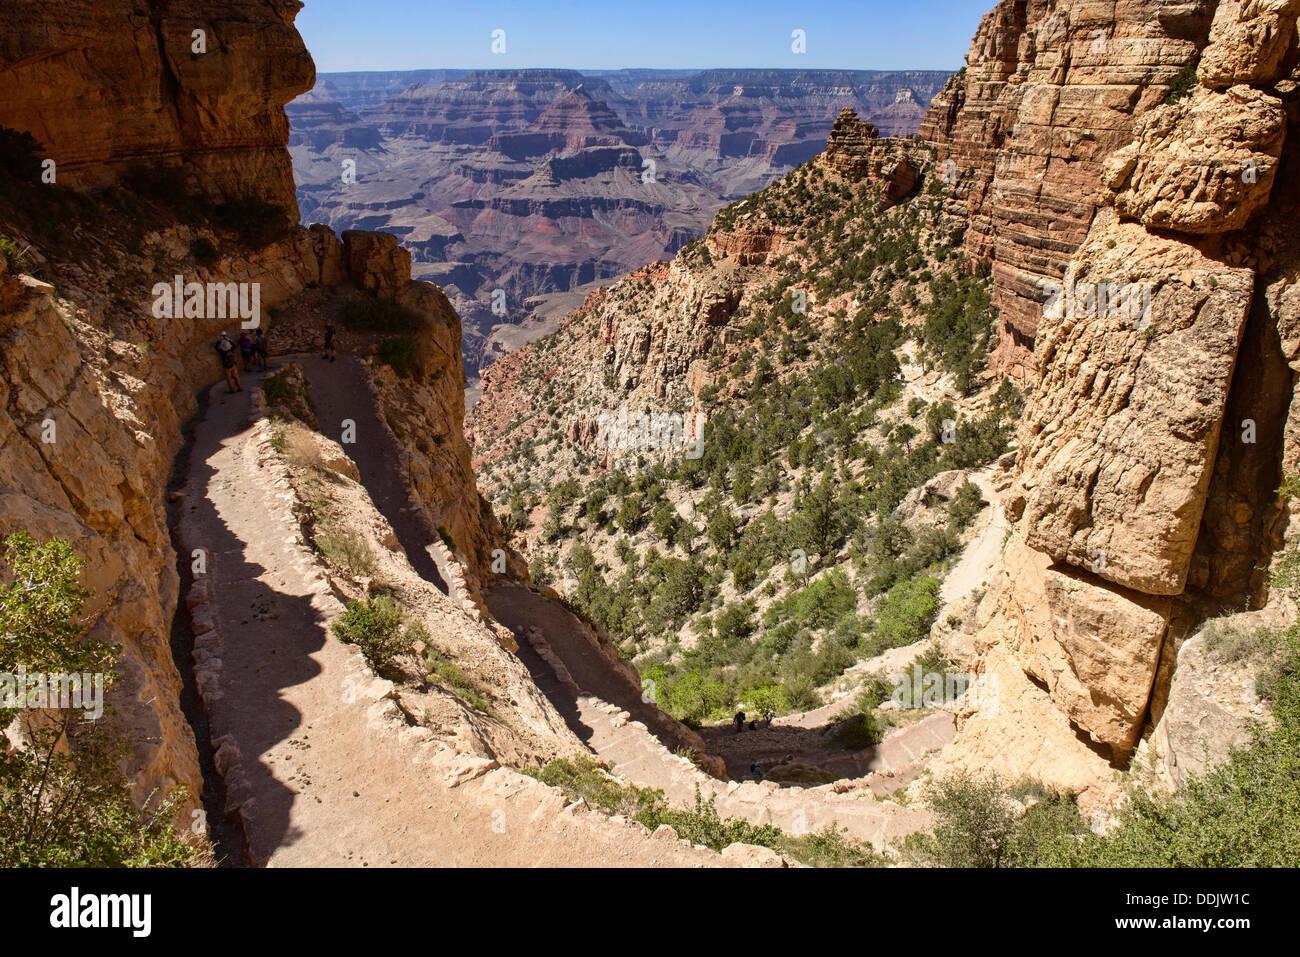 View down the Kaibab Trail, Grand Canyon National Park, Arizona - Stock Image